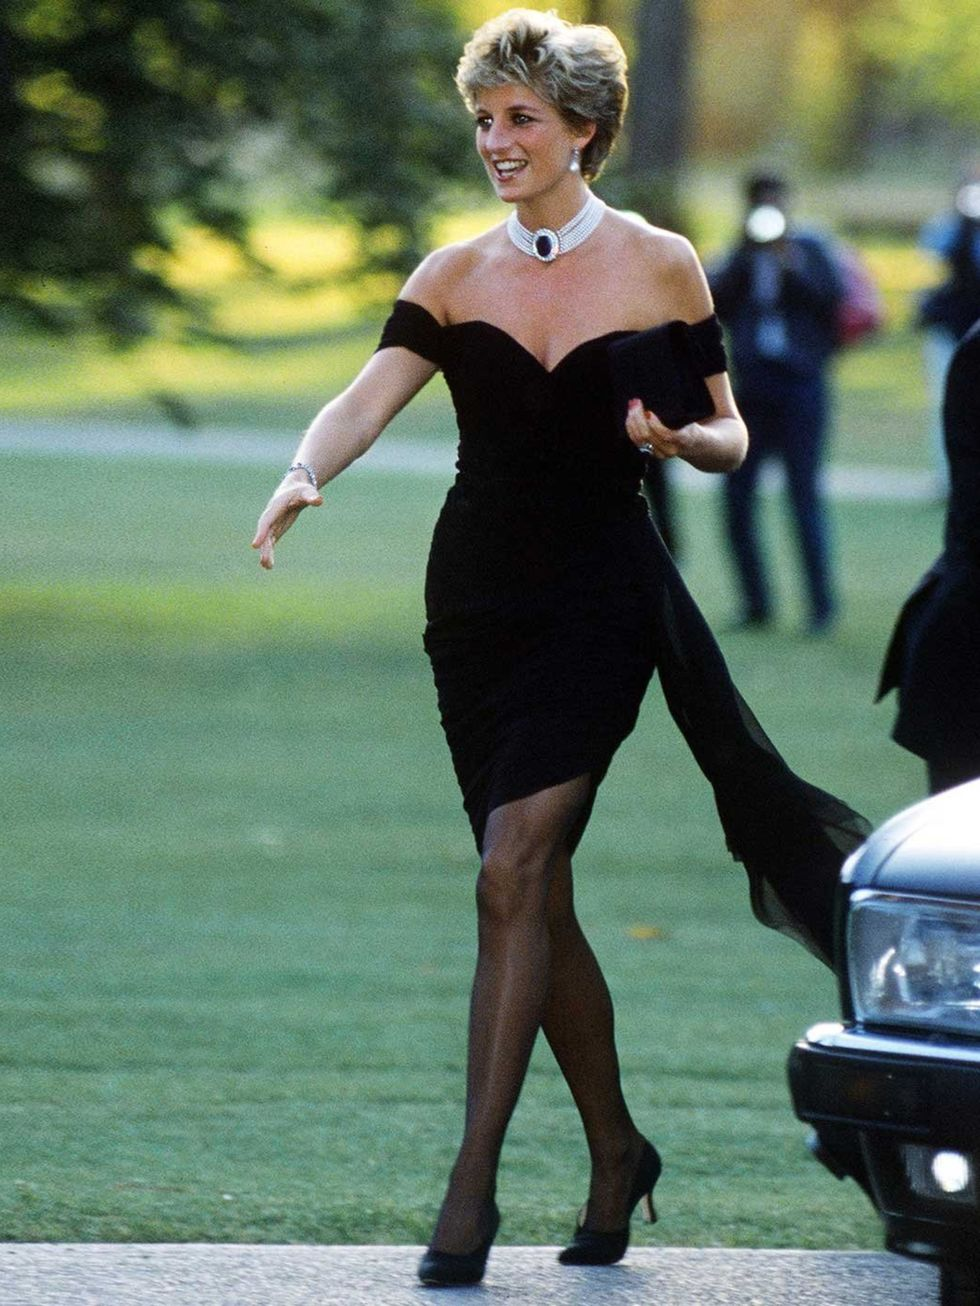 Vương phi Diana mặc little black dress của NTK Chrsitina Stambolain năm 1994